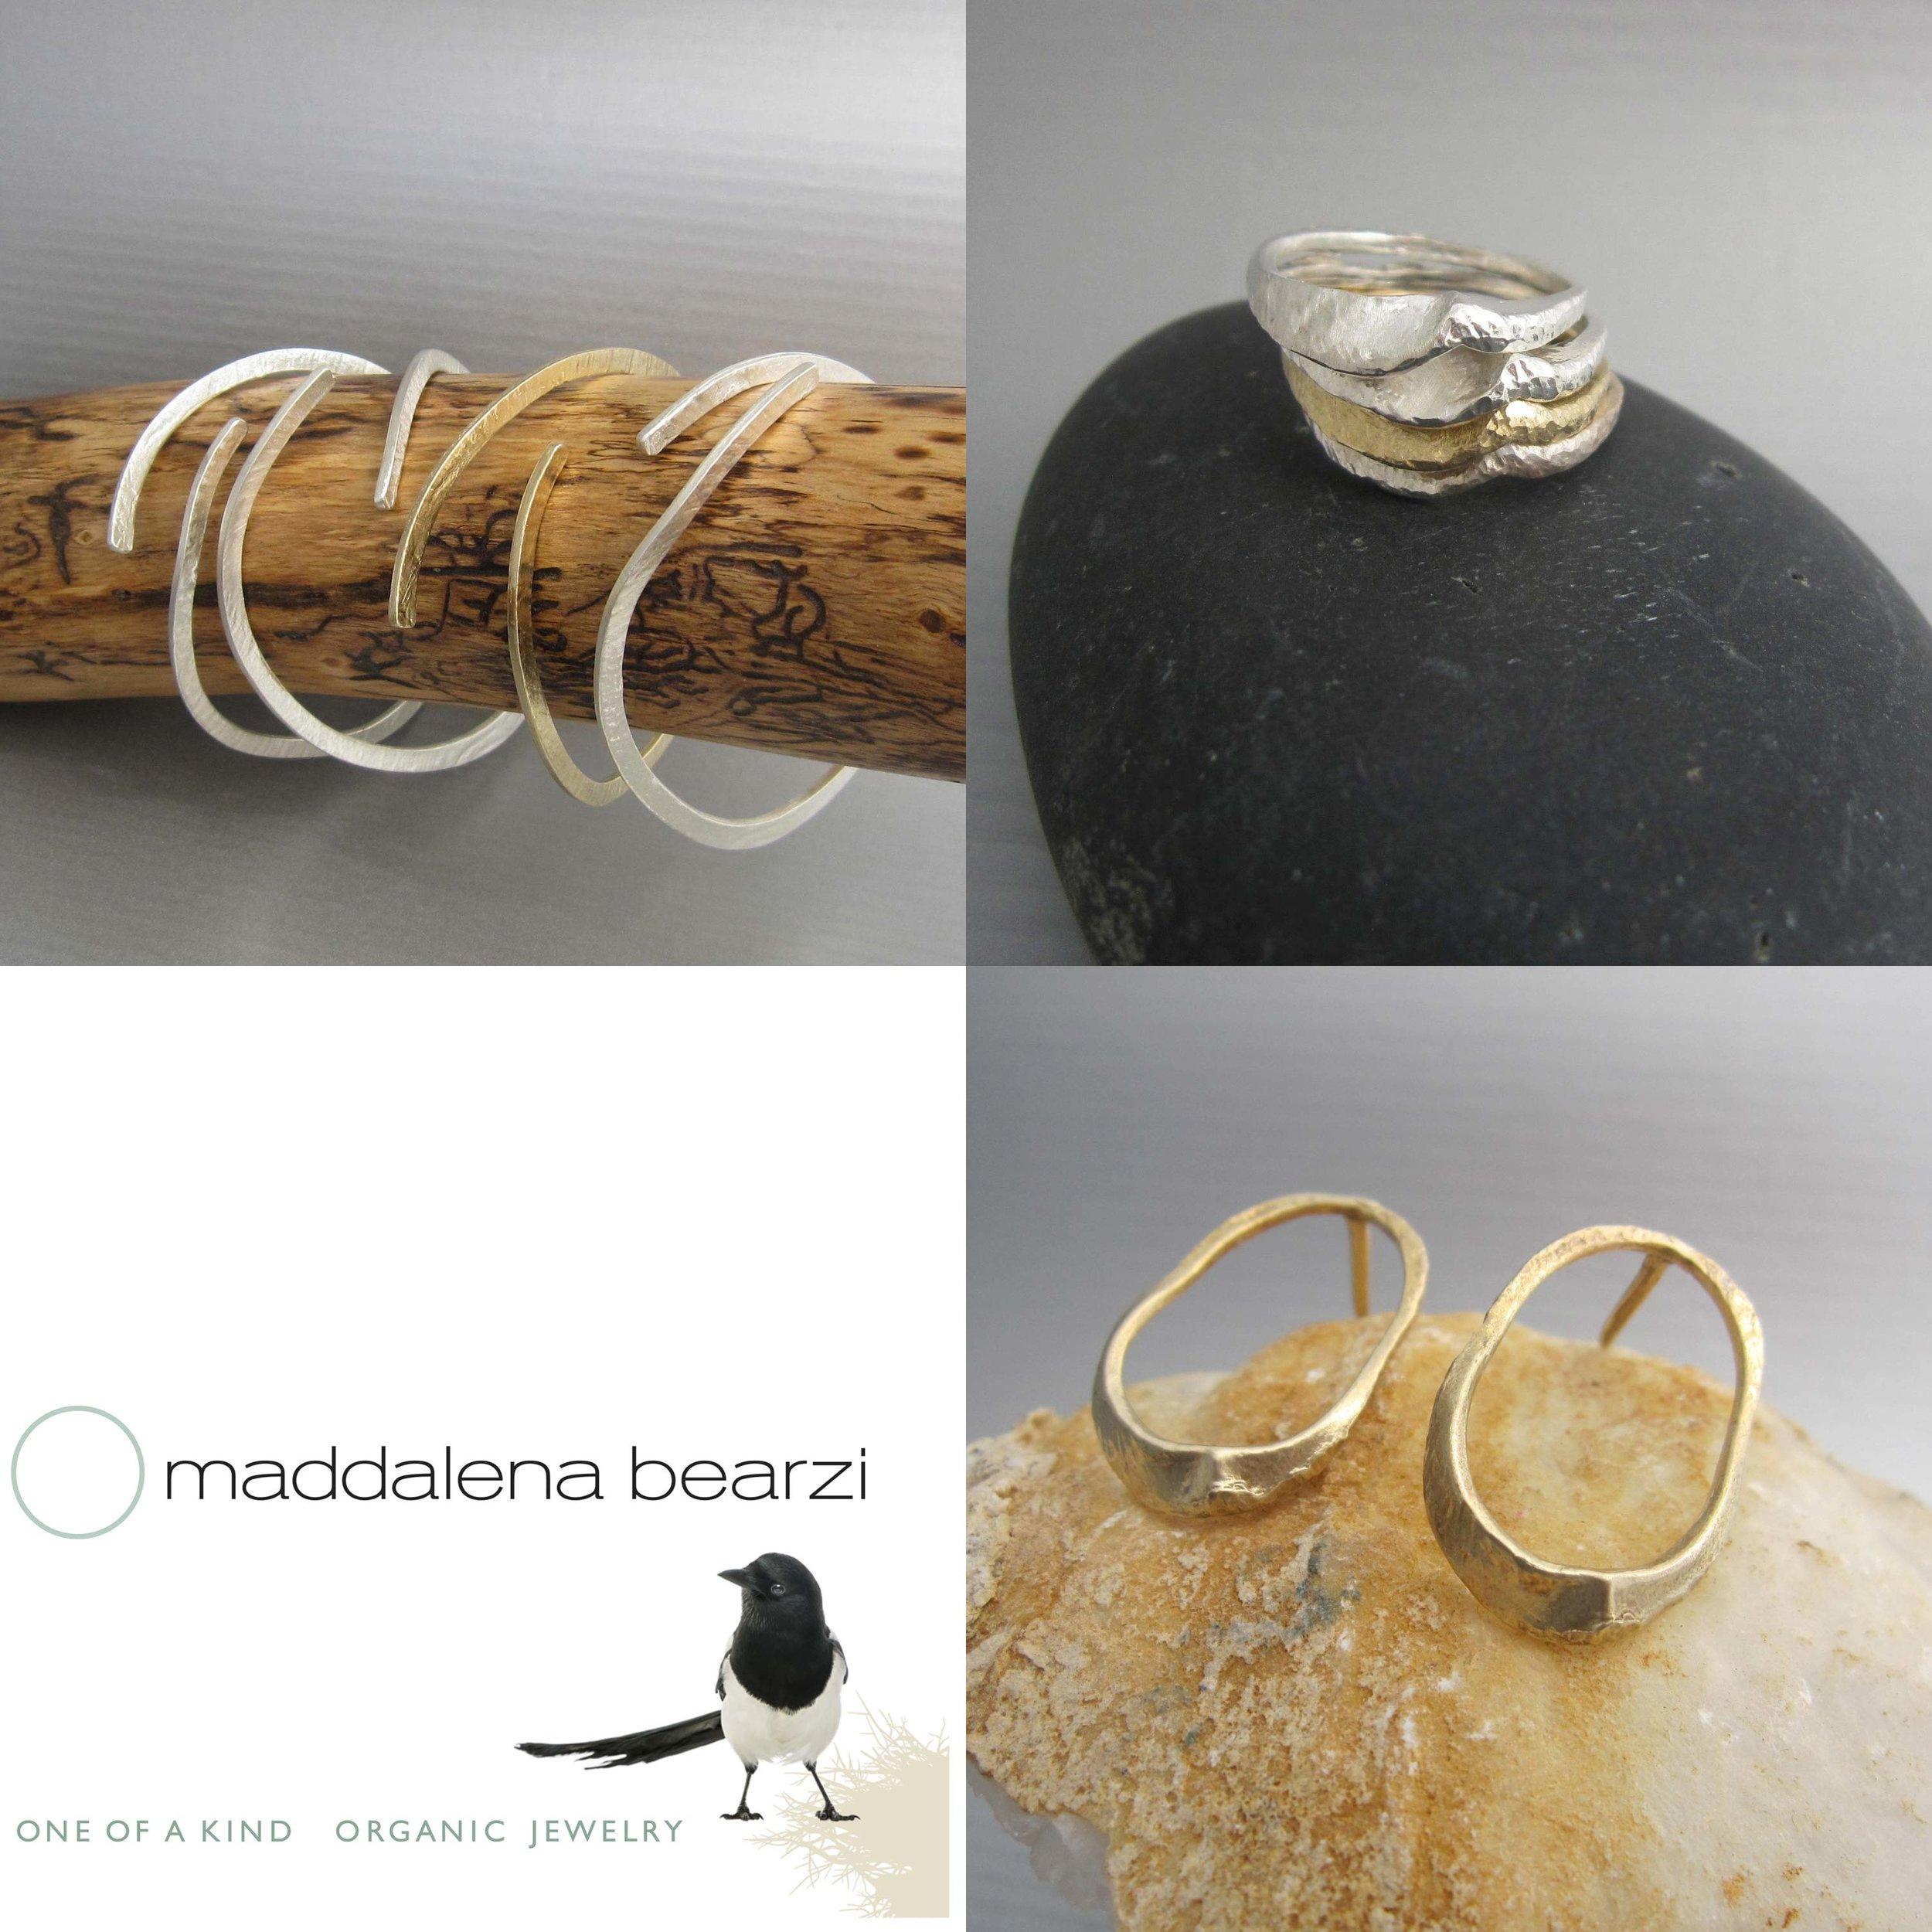 The ONDA jewelry collection handmade by Italian designer Maddalena Bearzi